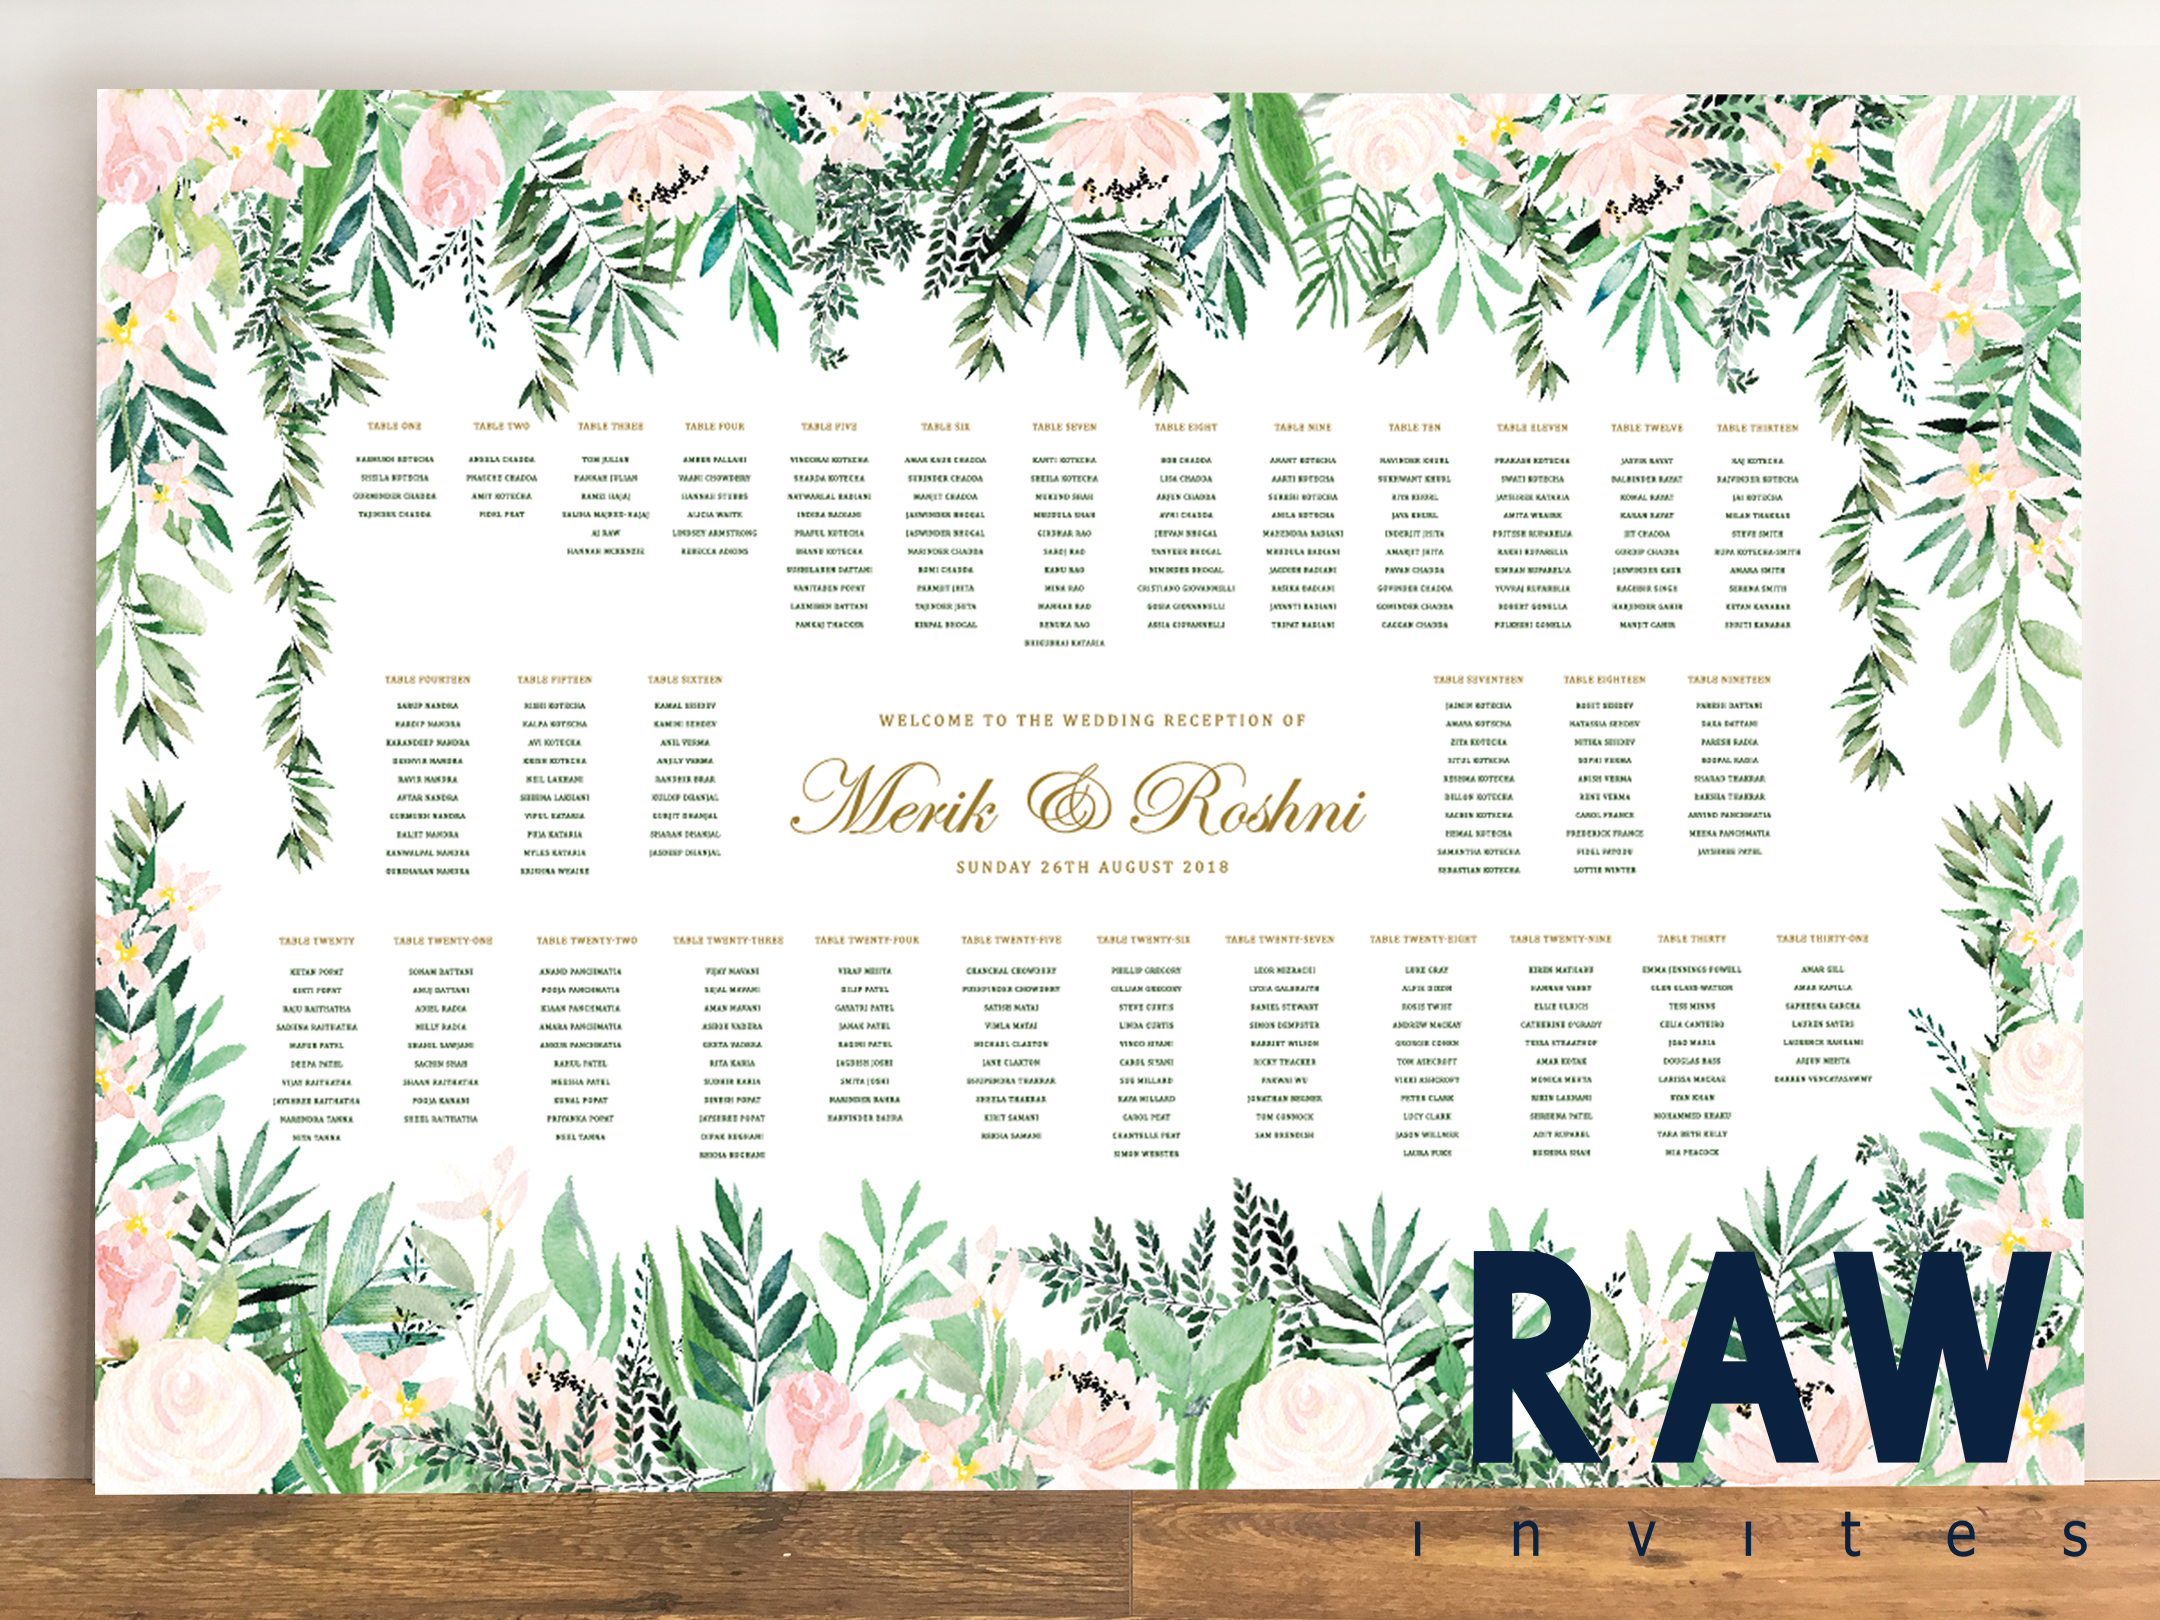 Merik & Roshni (Welcome to the jungle)